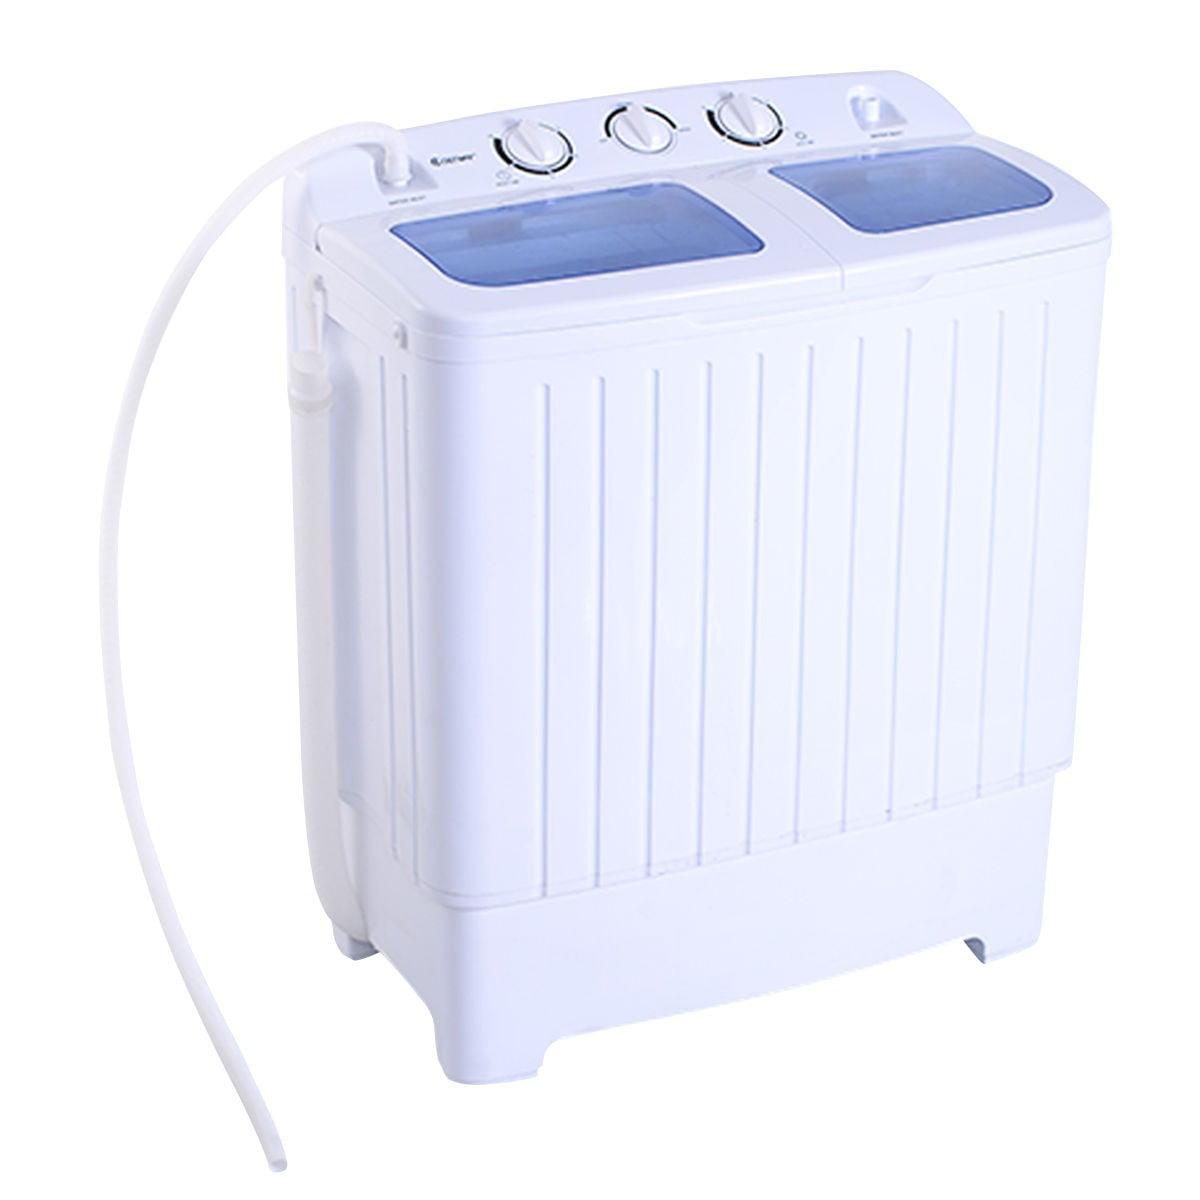 compact washer machine